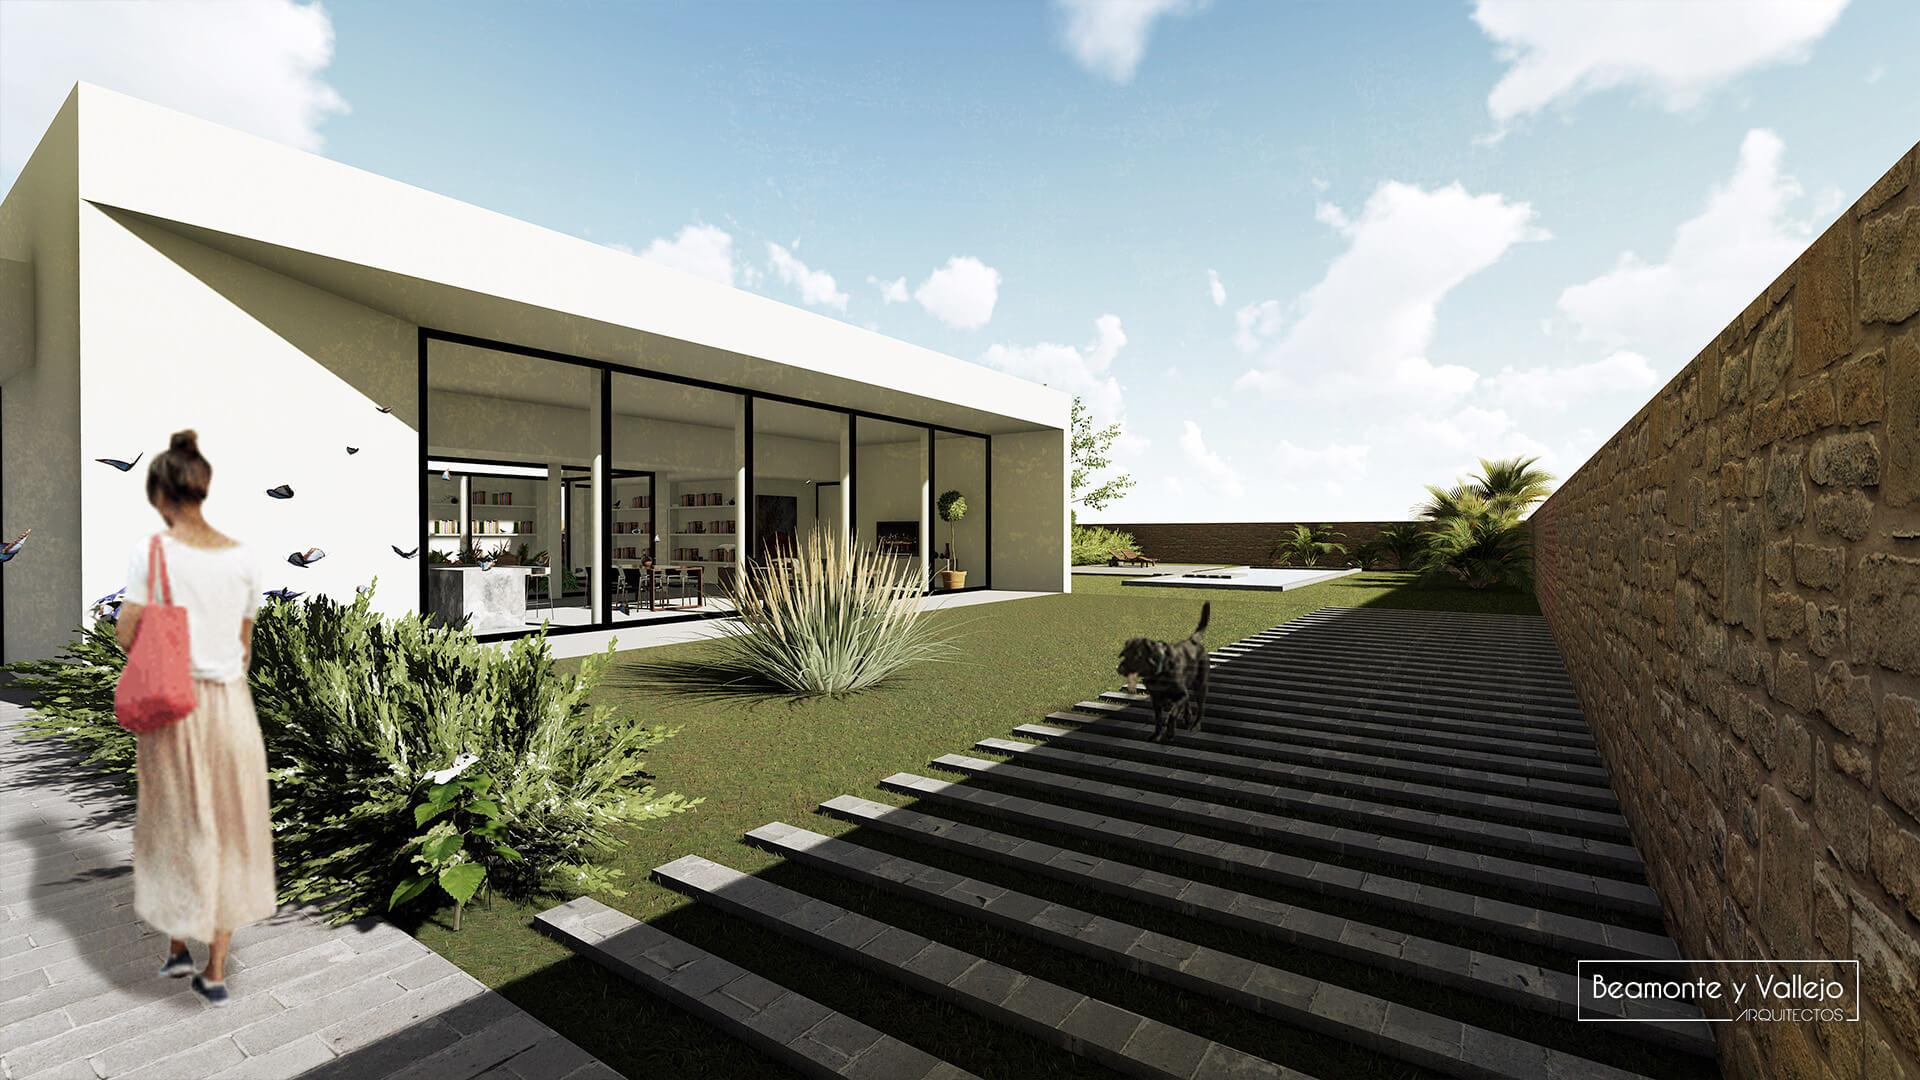 Beamonte y Vallejo arquitectos - Passivhaus El Zorongo, 2